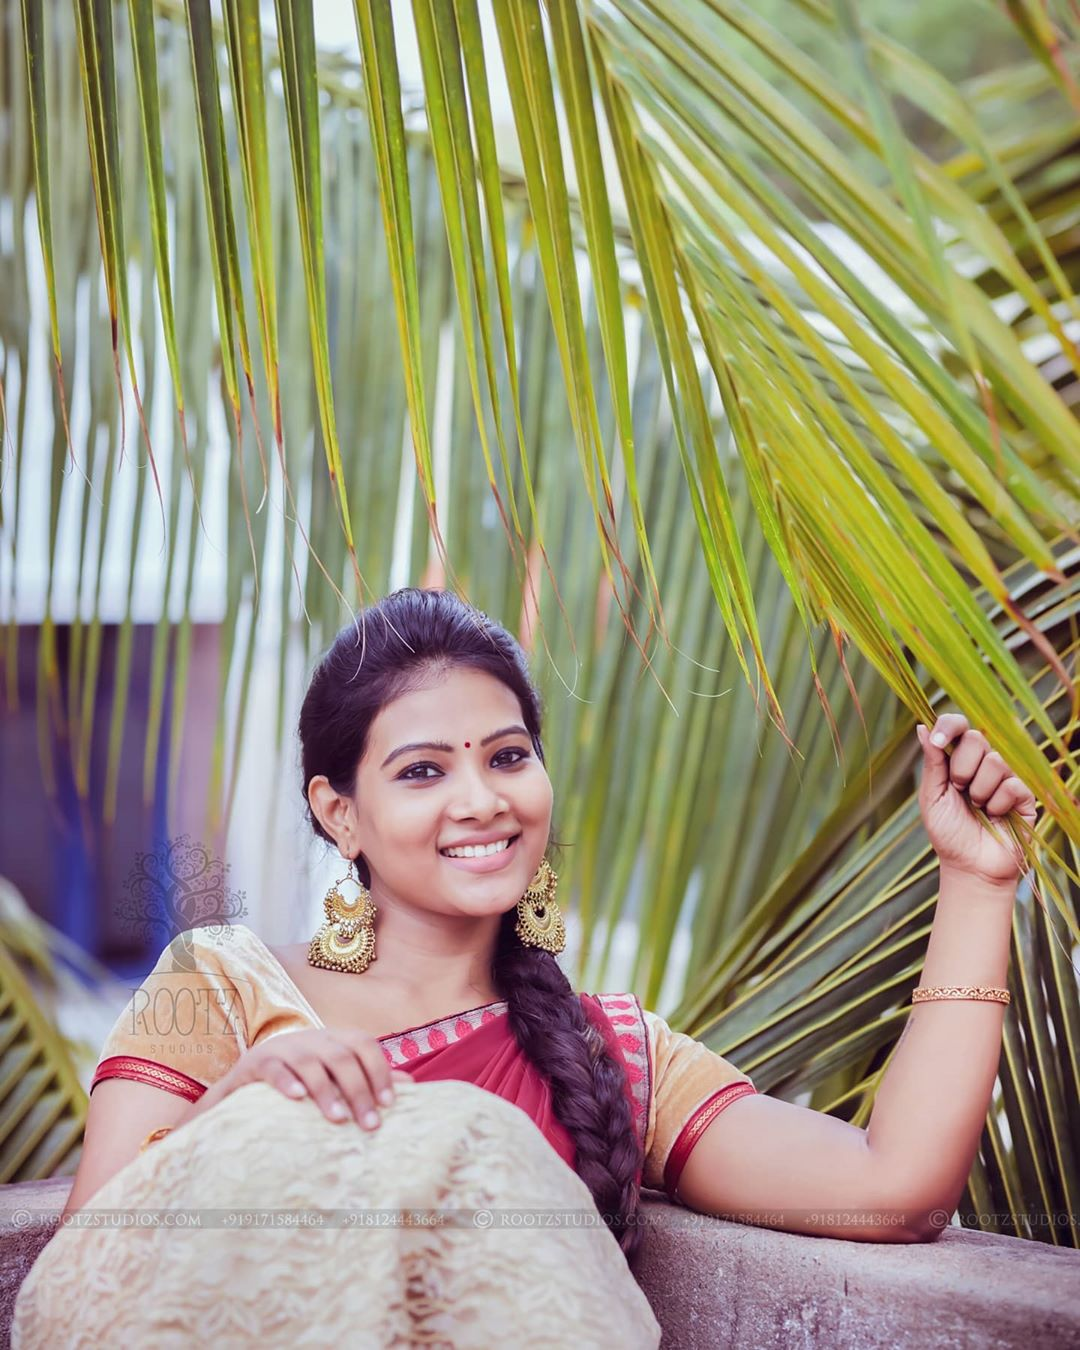 dhivya dhuraisamy homely saree photos (14)